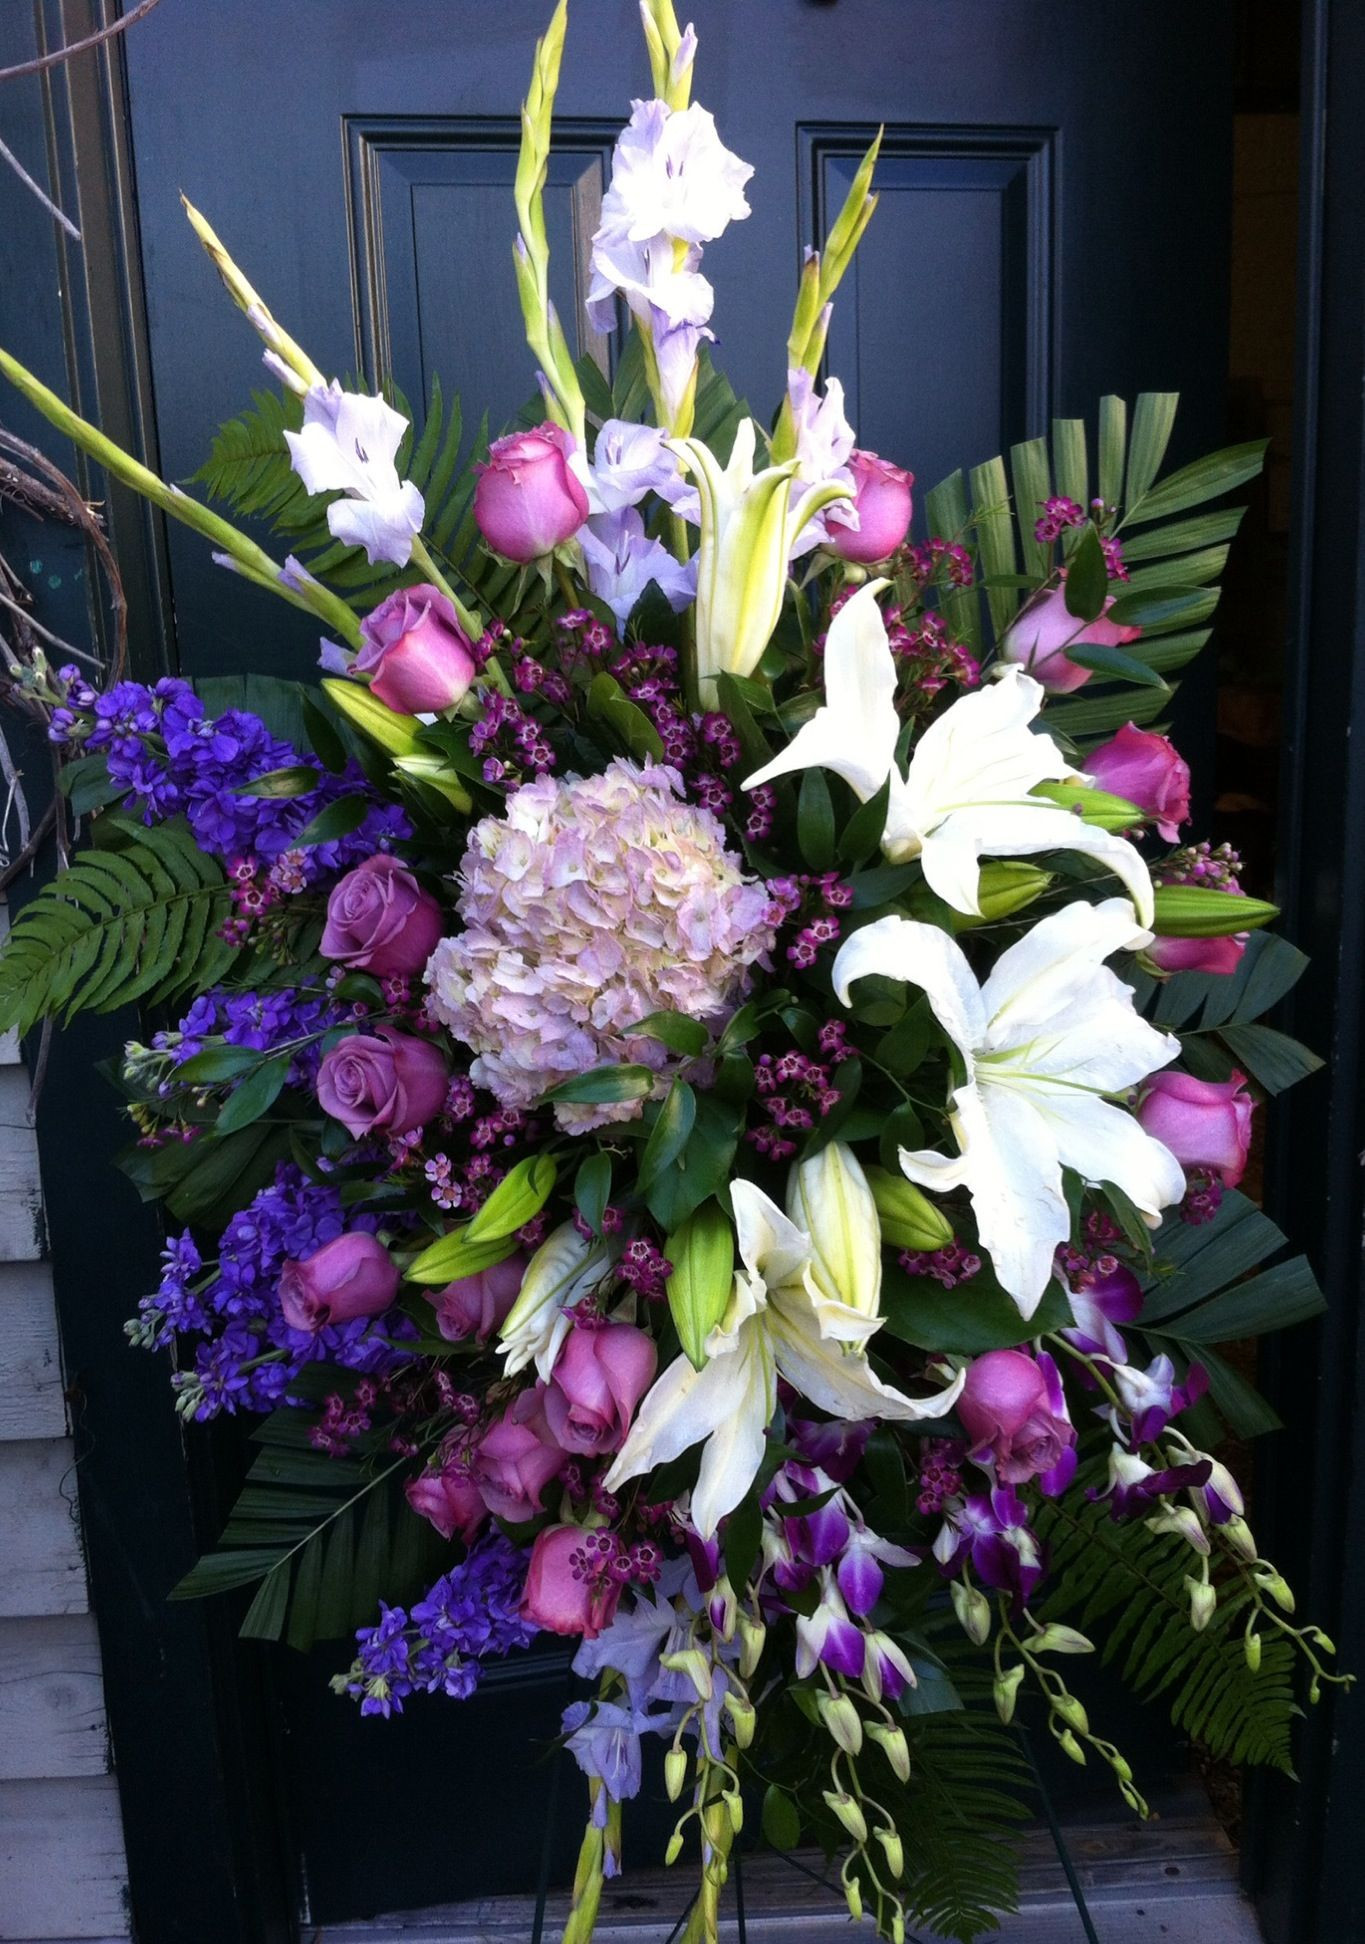 18elegant Wax Flower Colors More Image Ideas